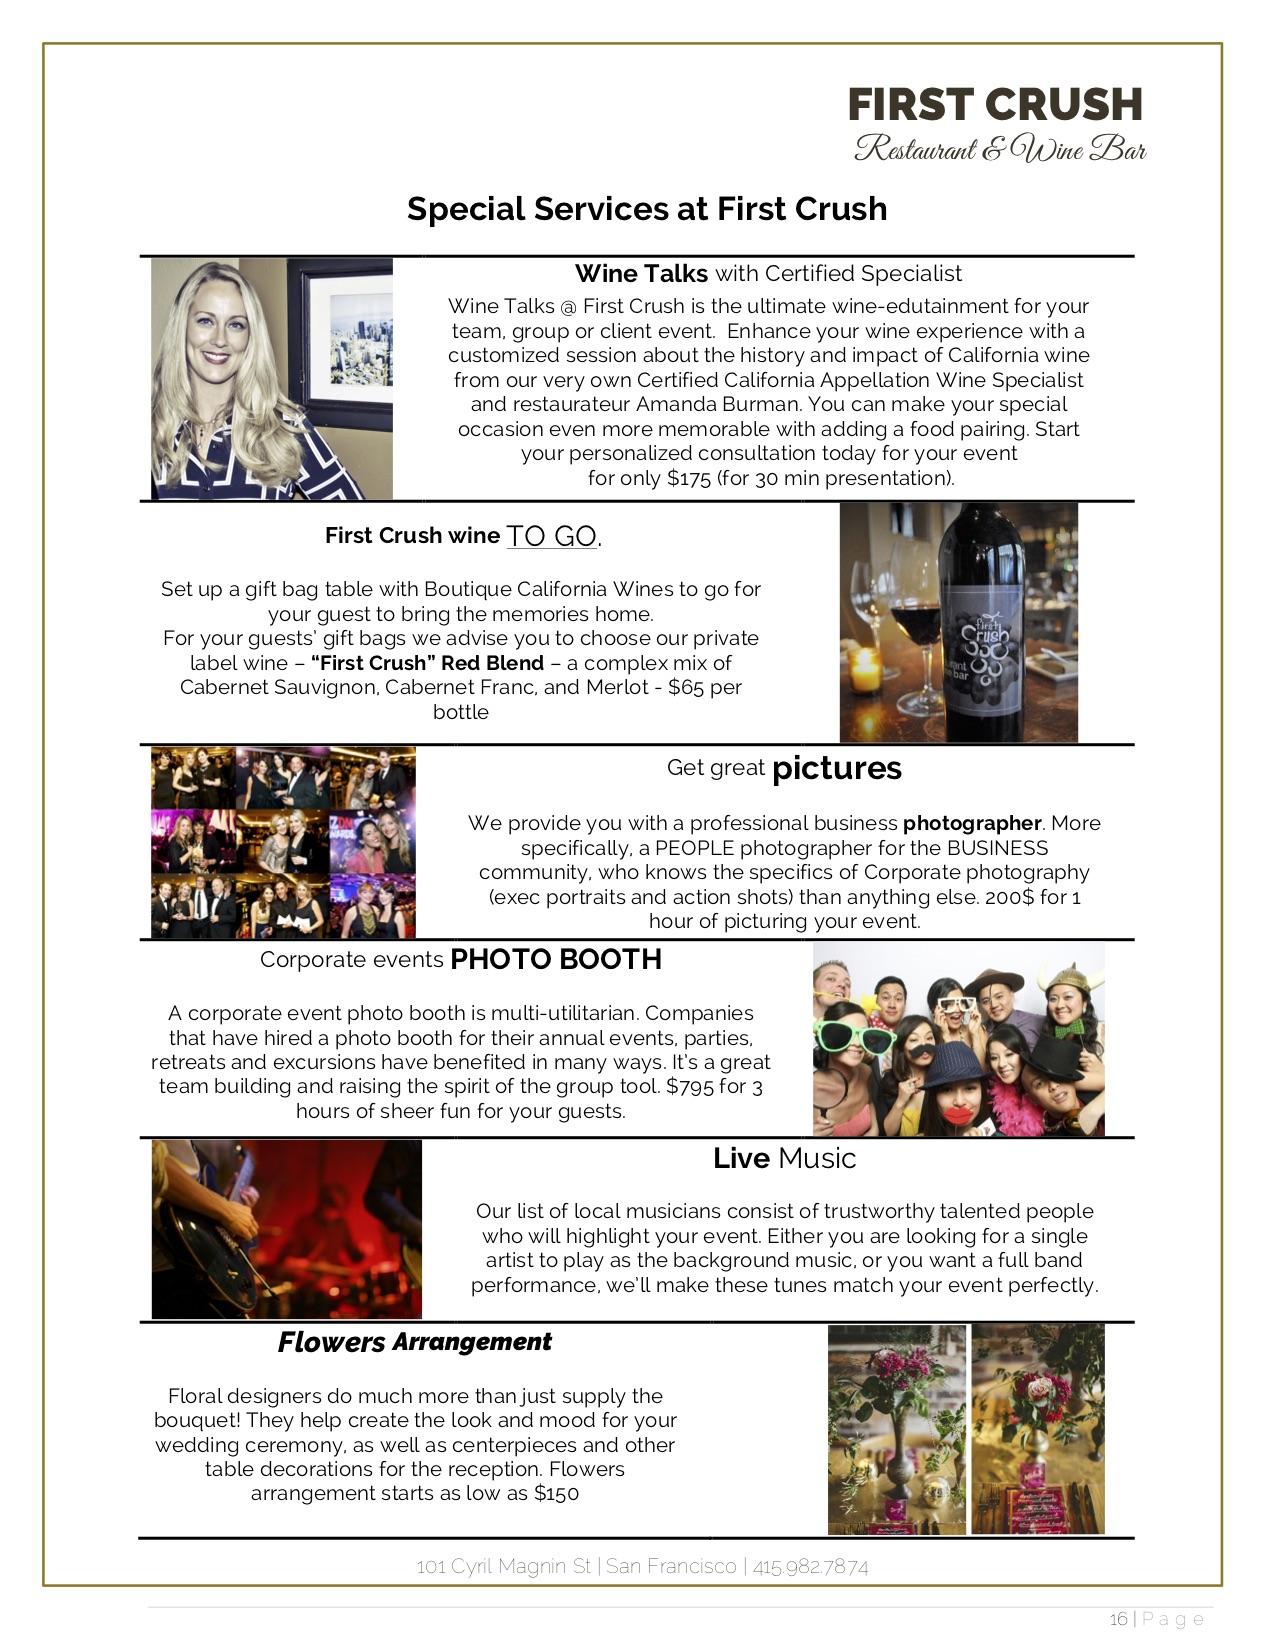 First Crush Event Presentation 9.jpg